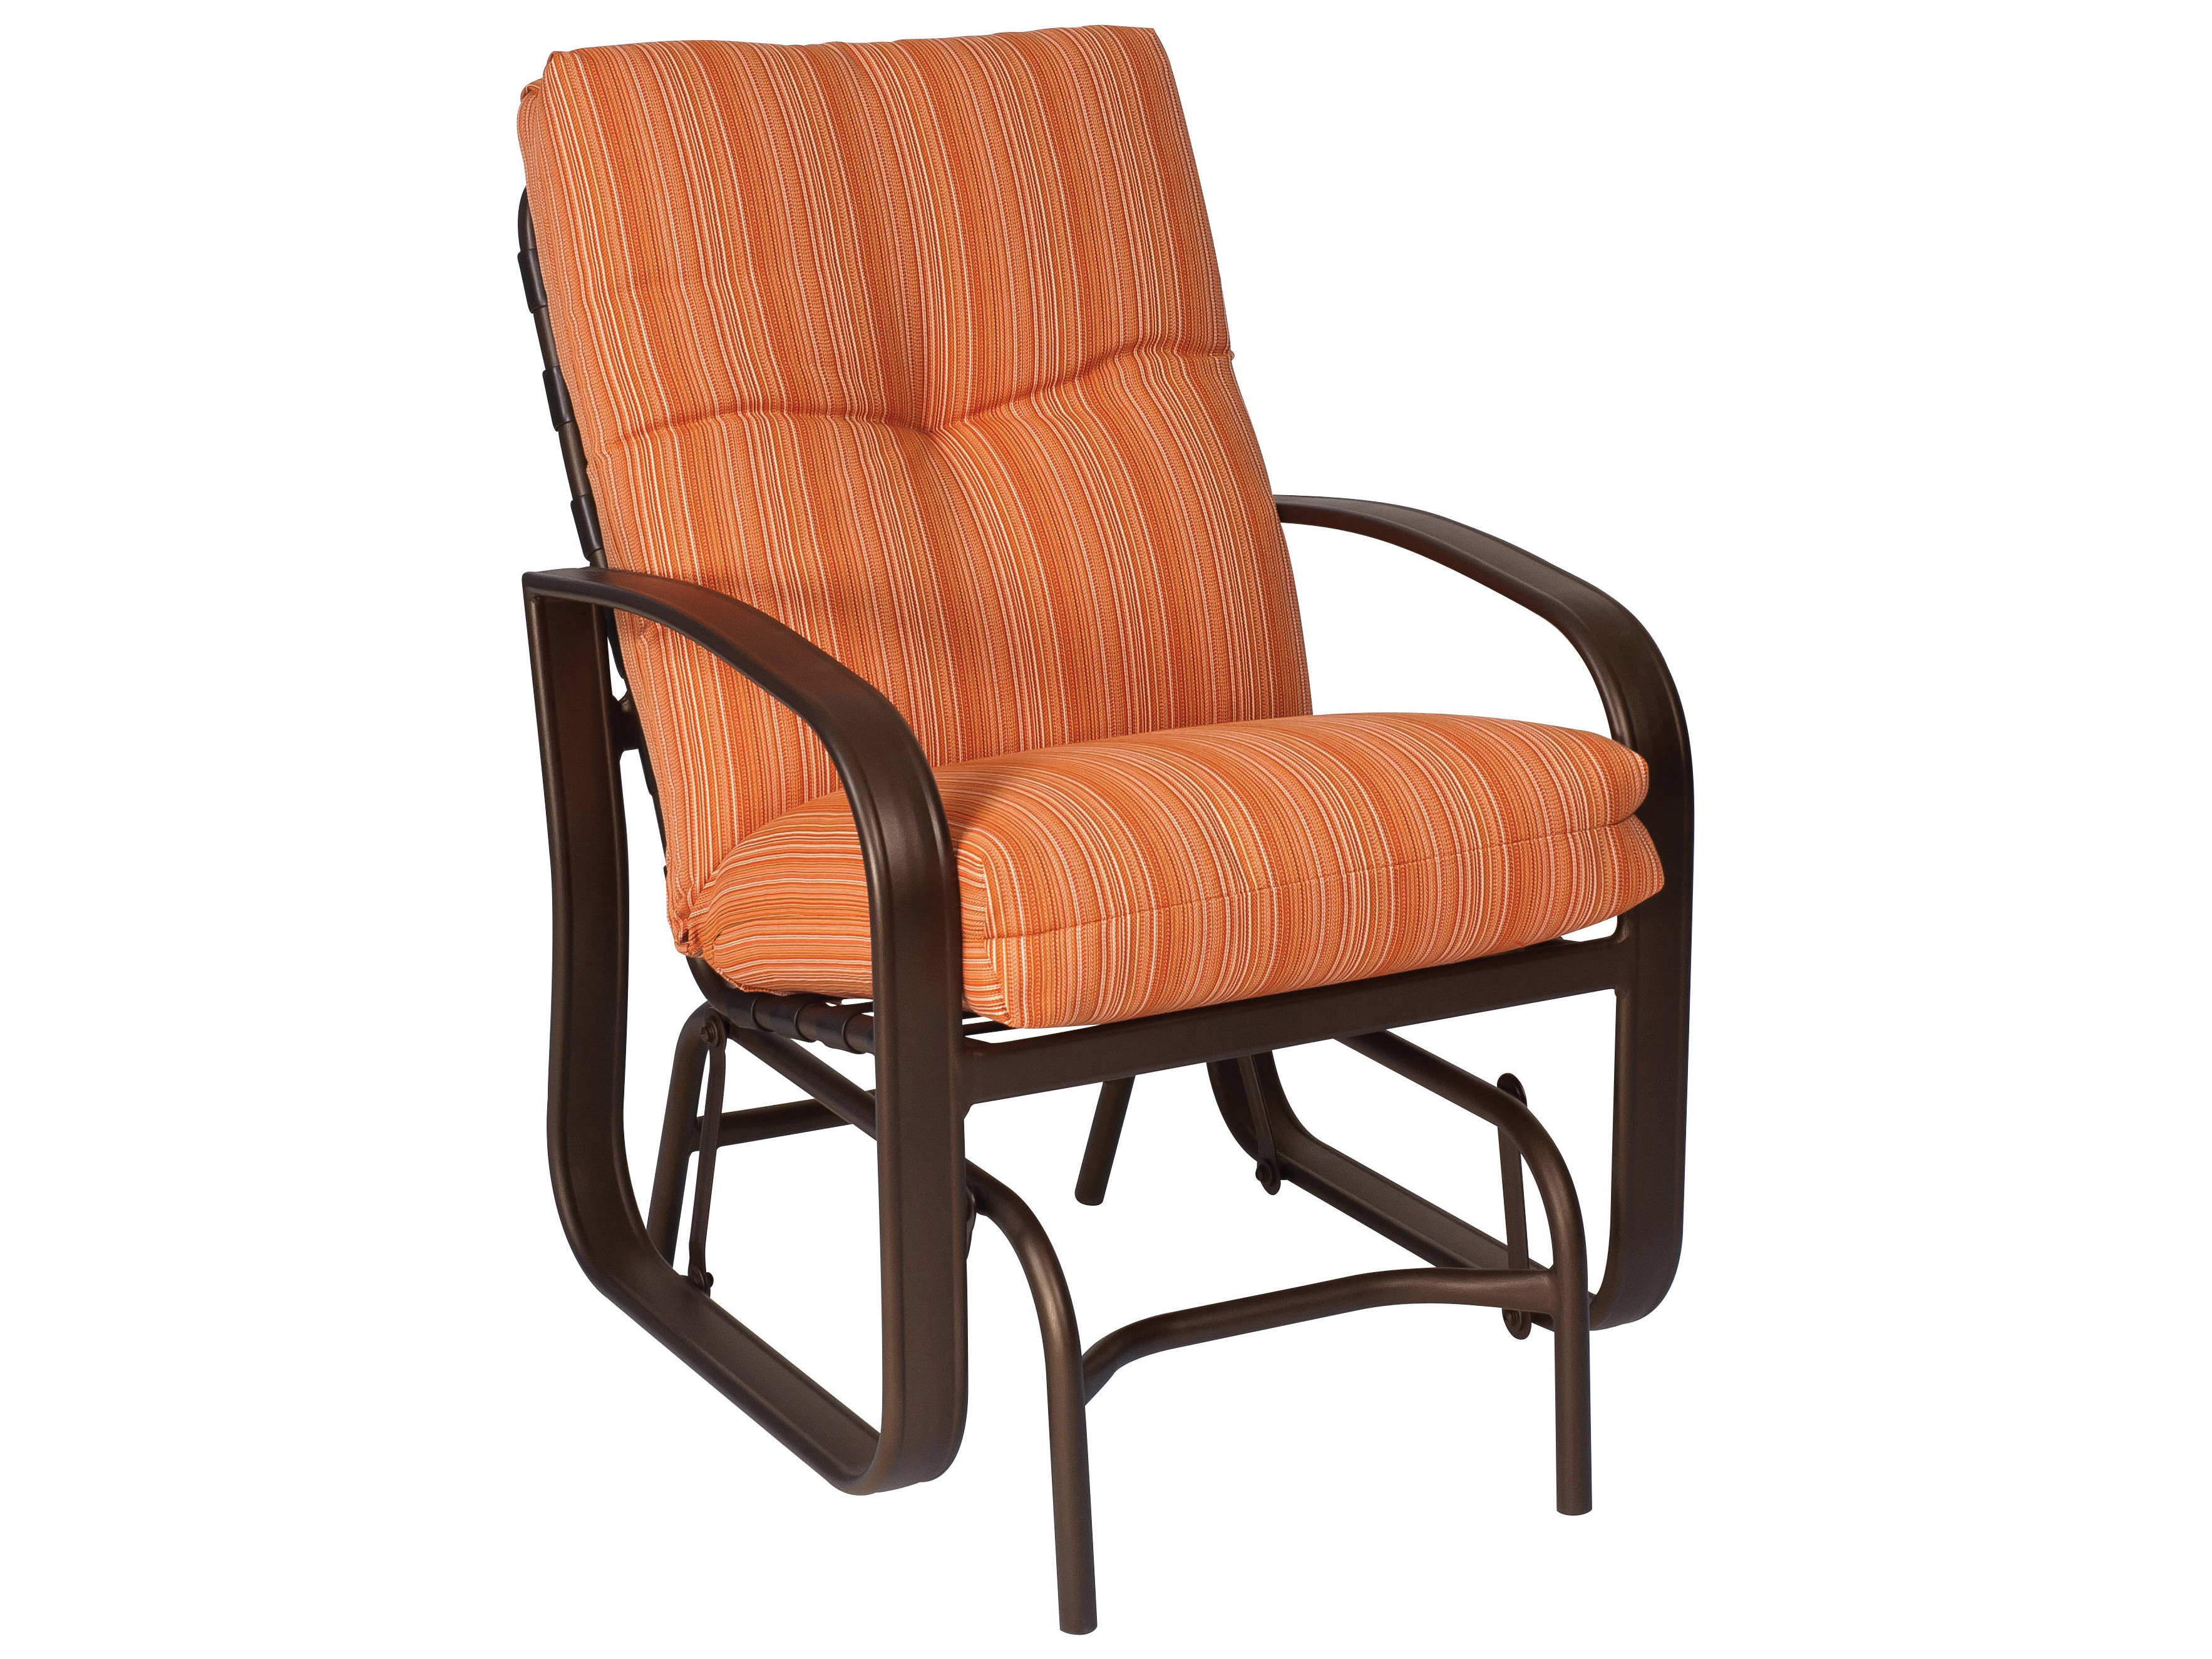 Woodard Cayman Isle Gliding Lounge Chair Replacement Cushions